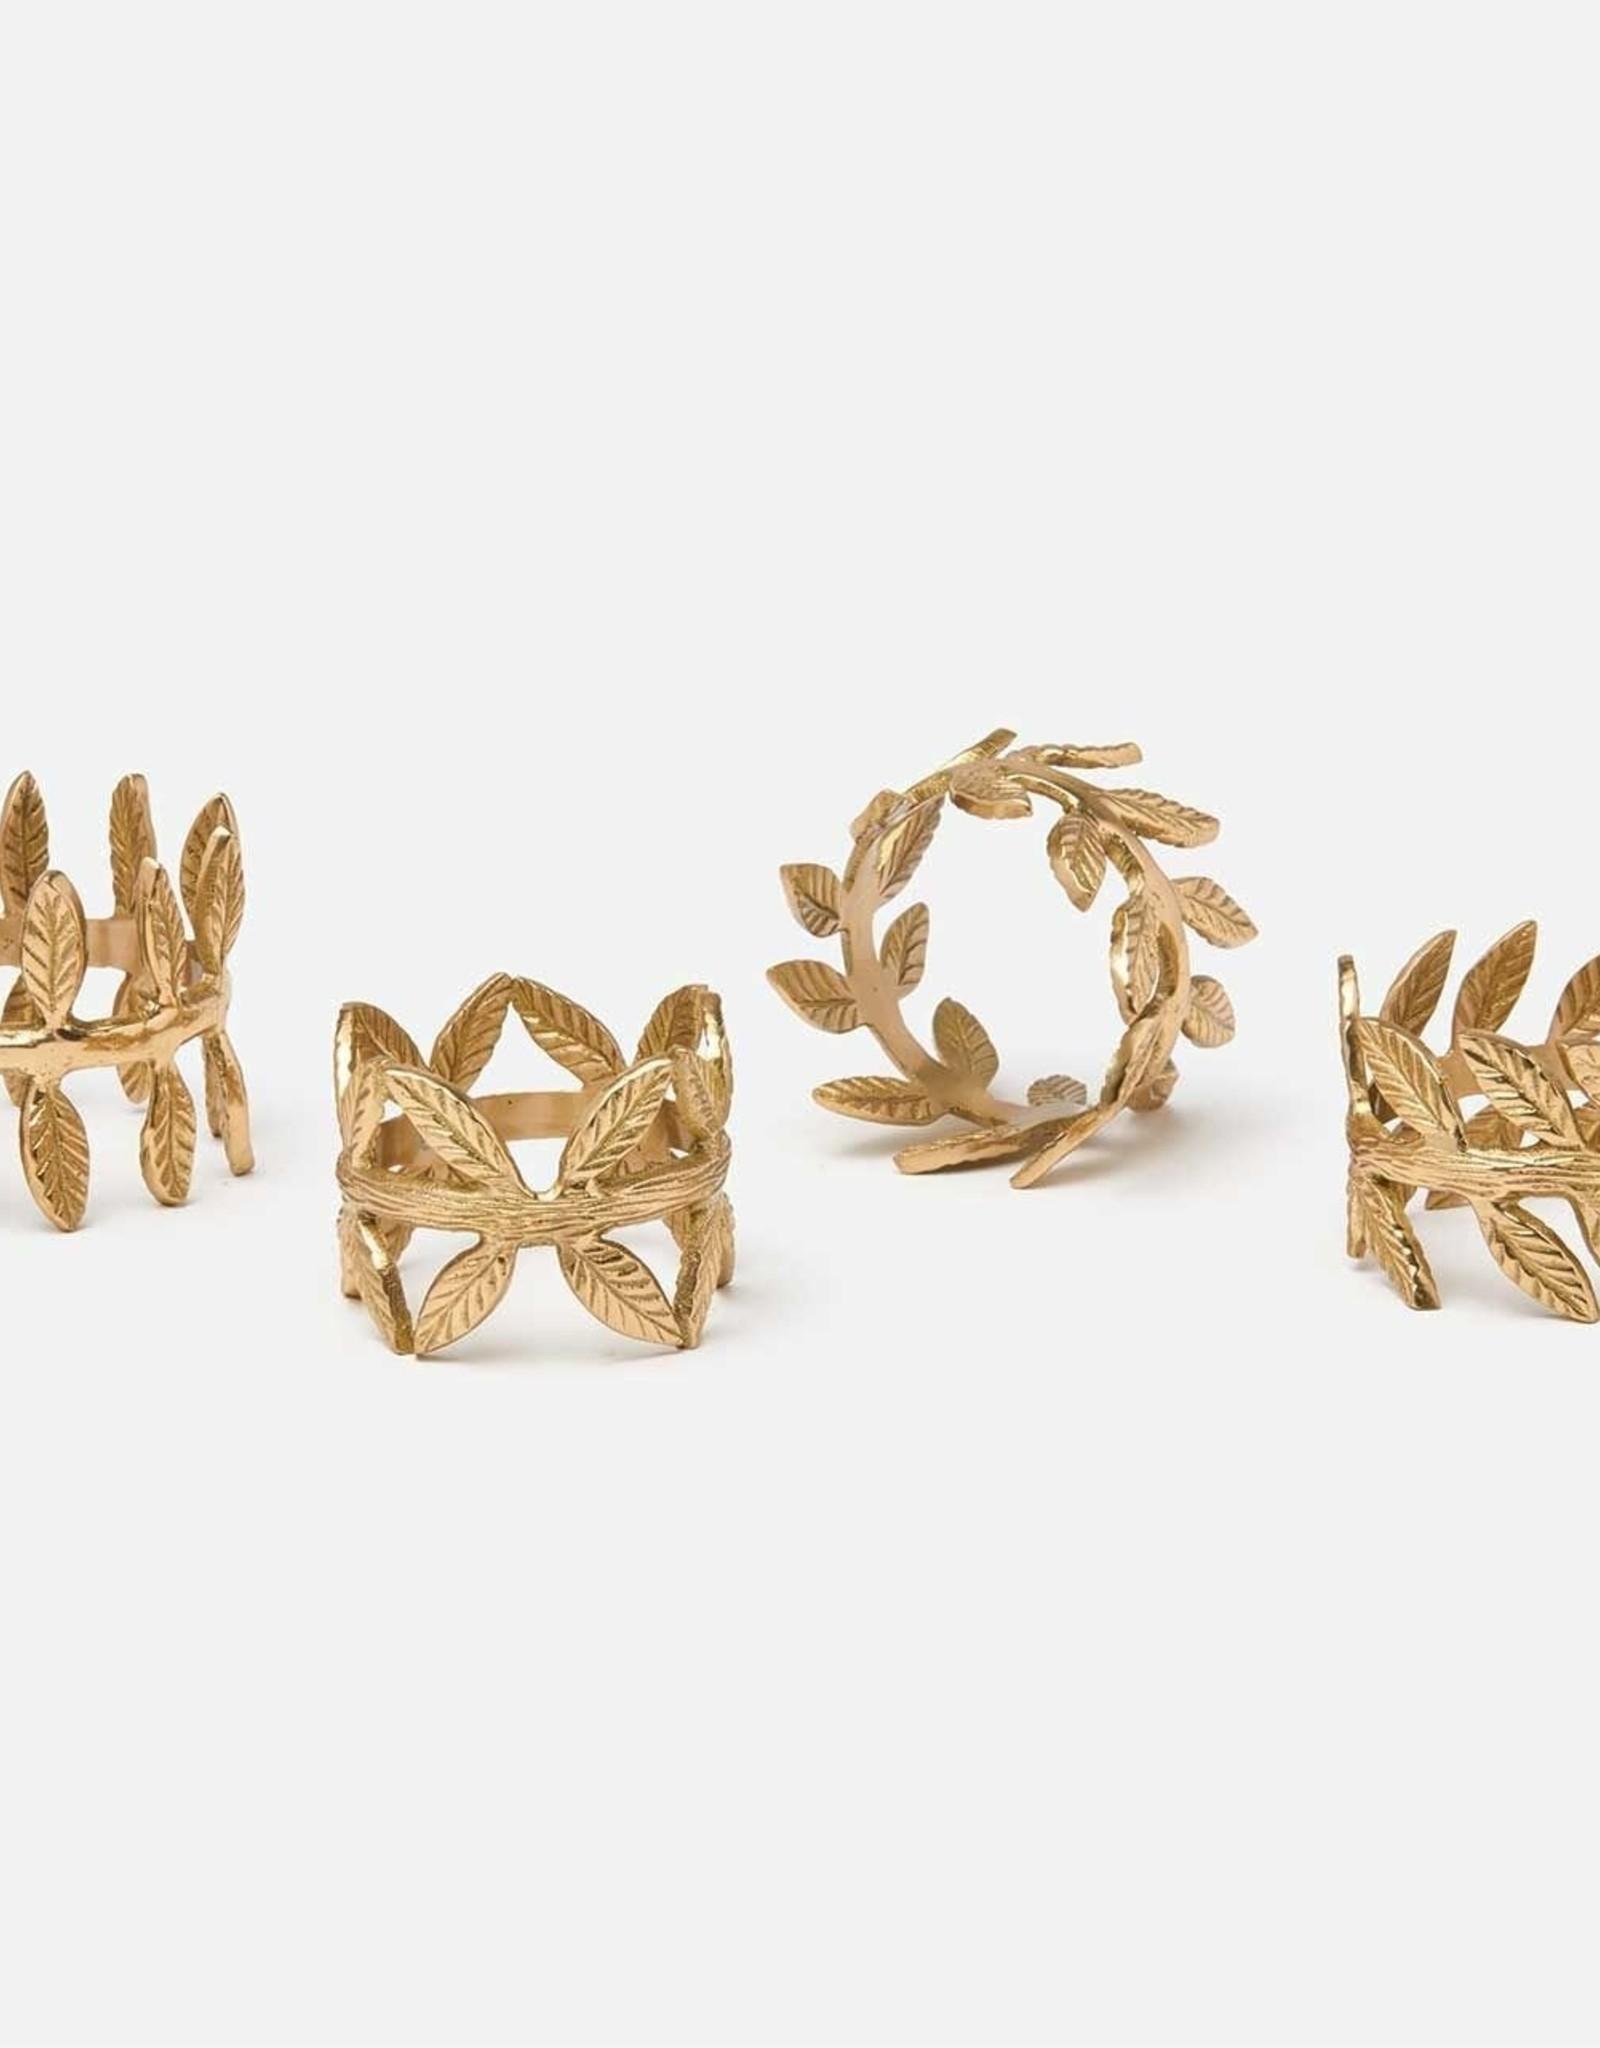 Blue Pheasant Emma Gold Napkin Ring - Set of 4